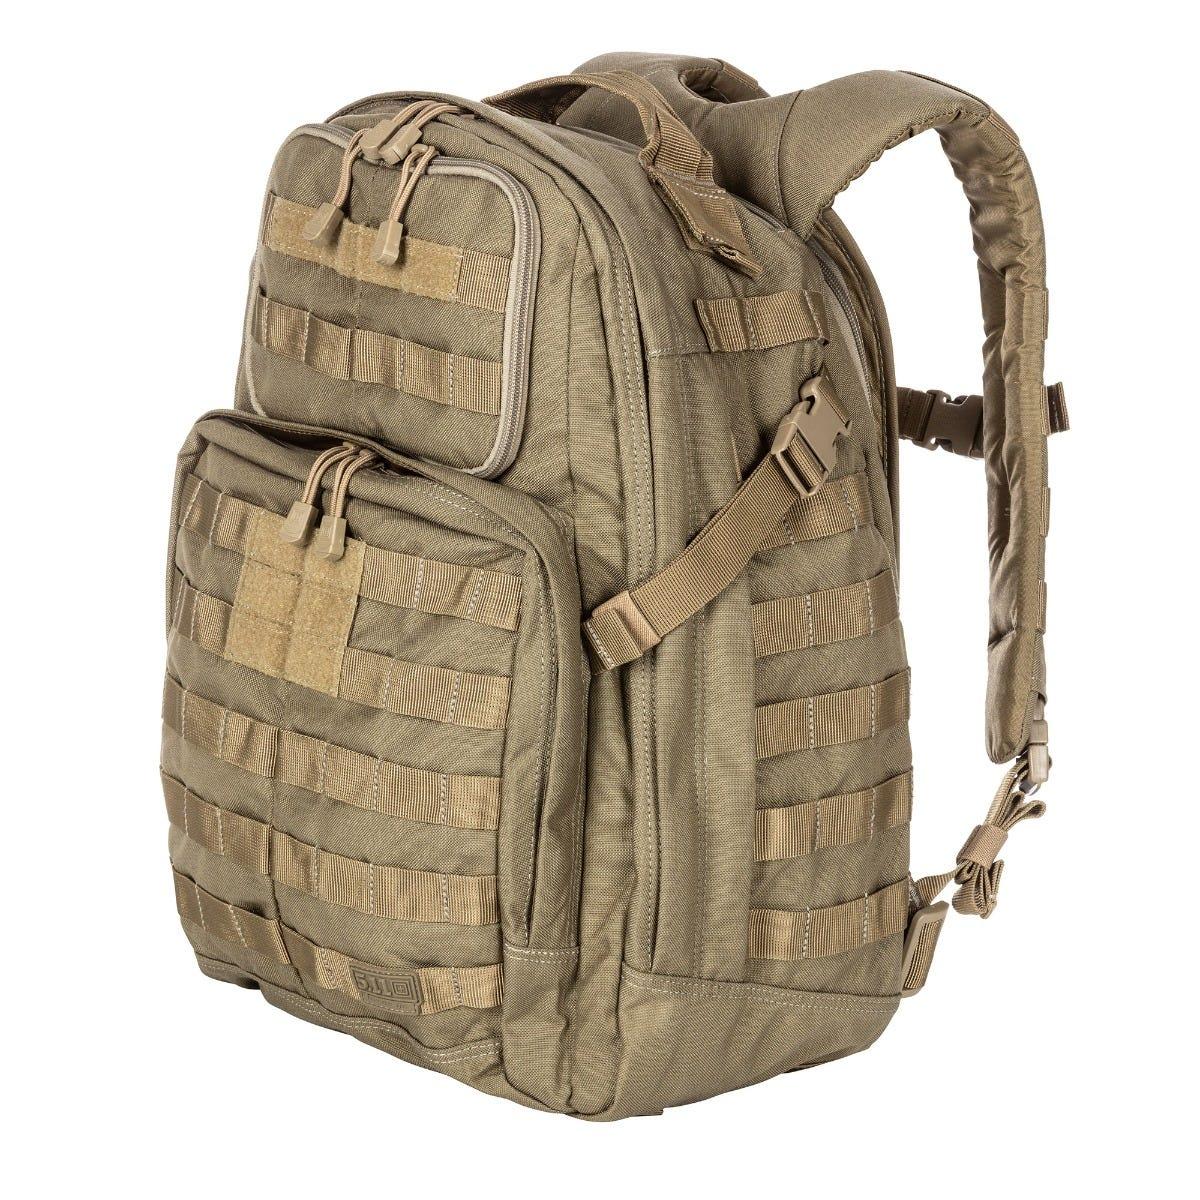 5.11 Tactical RUSH24 Backpack 37L (Khaki/Tan)